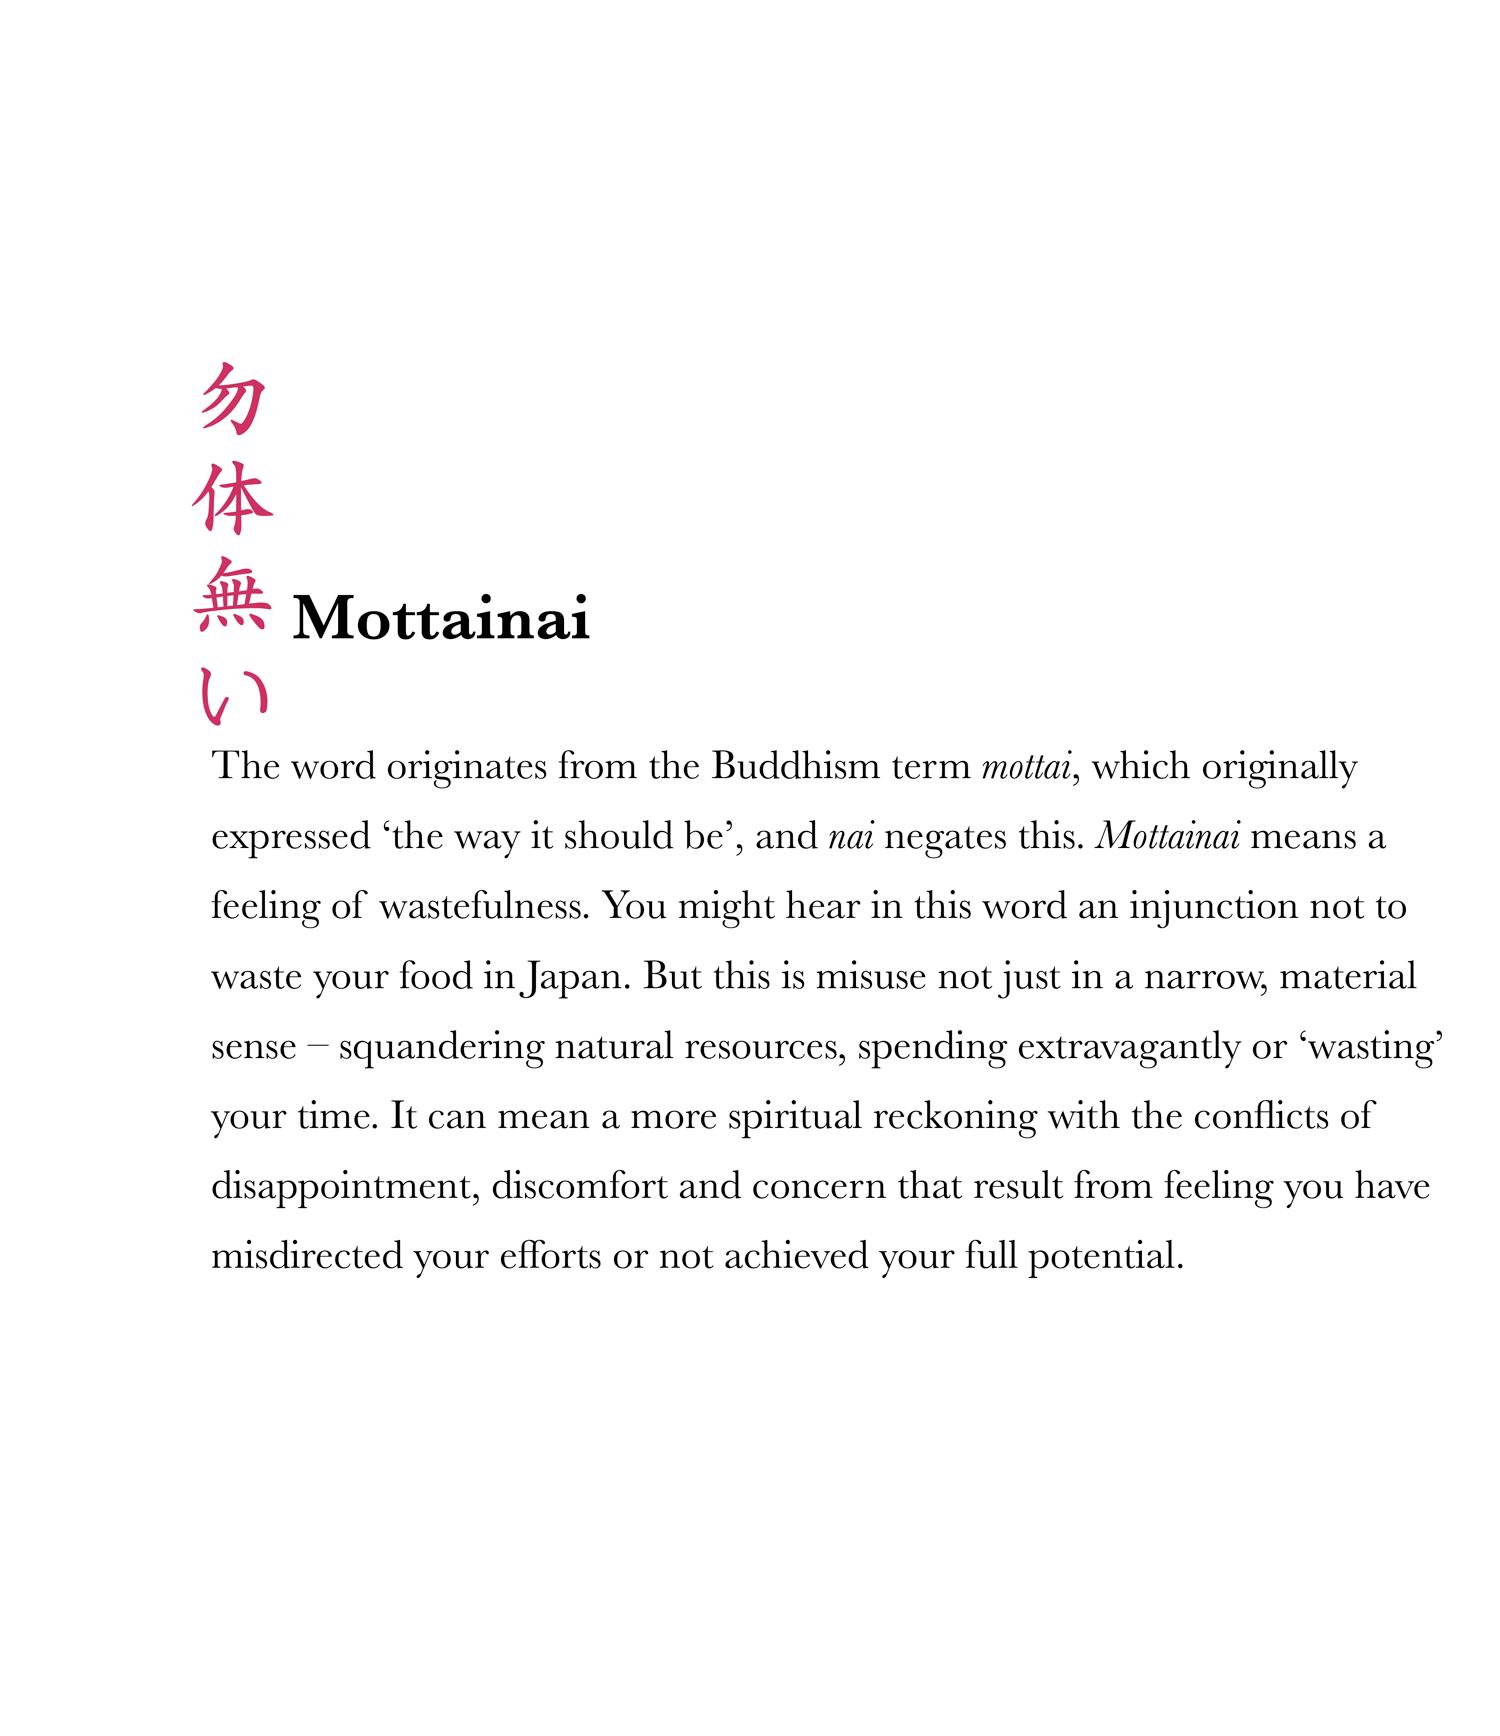 Ikigai-mottainai-107.png